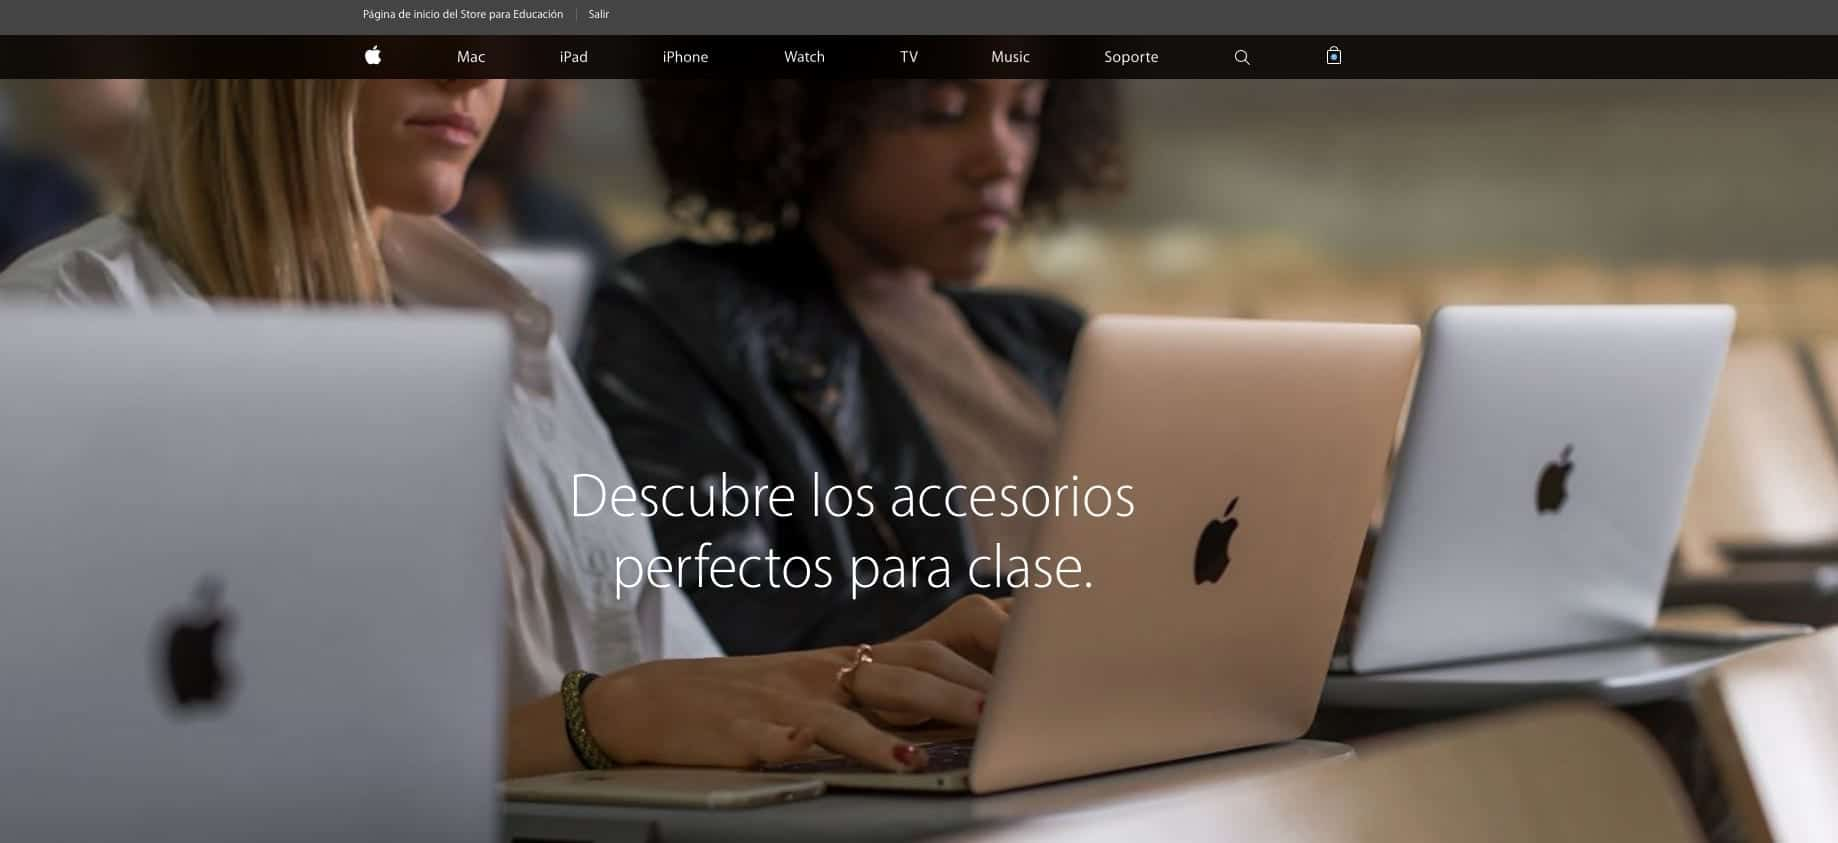 Mac Universidad